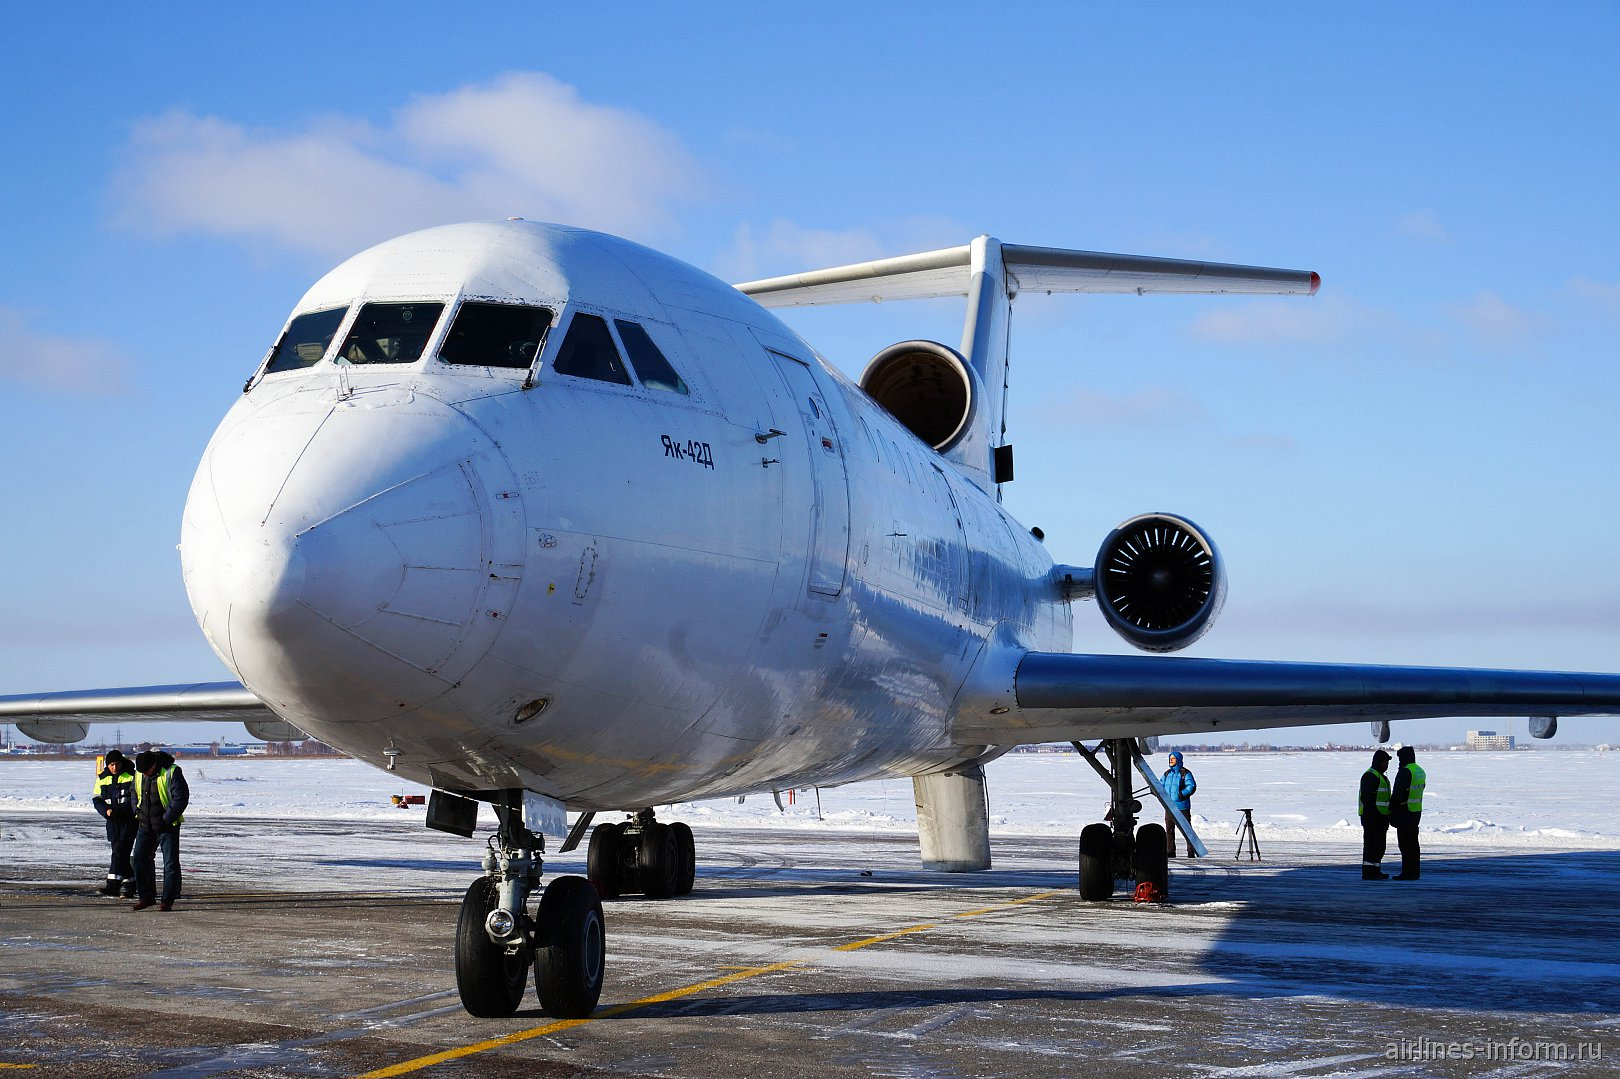 Уфа-Омск, авиакомпания Красавиа, ЯК-42Д, RA-42353